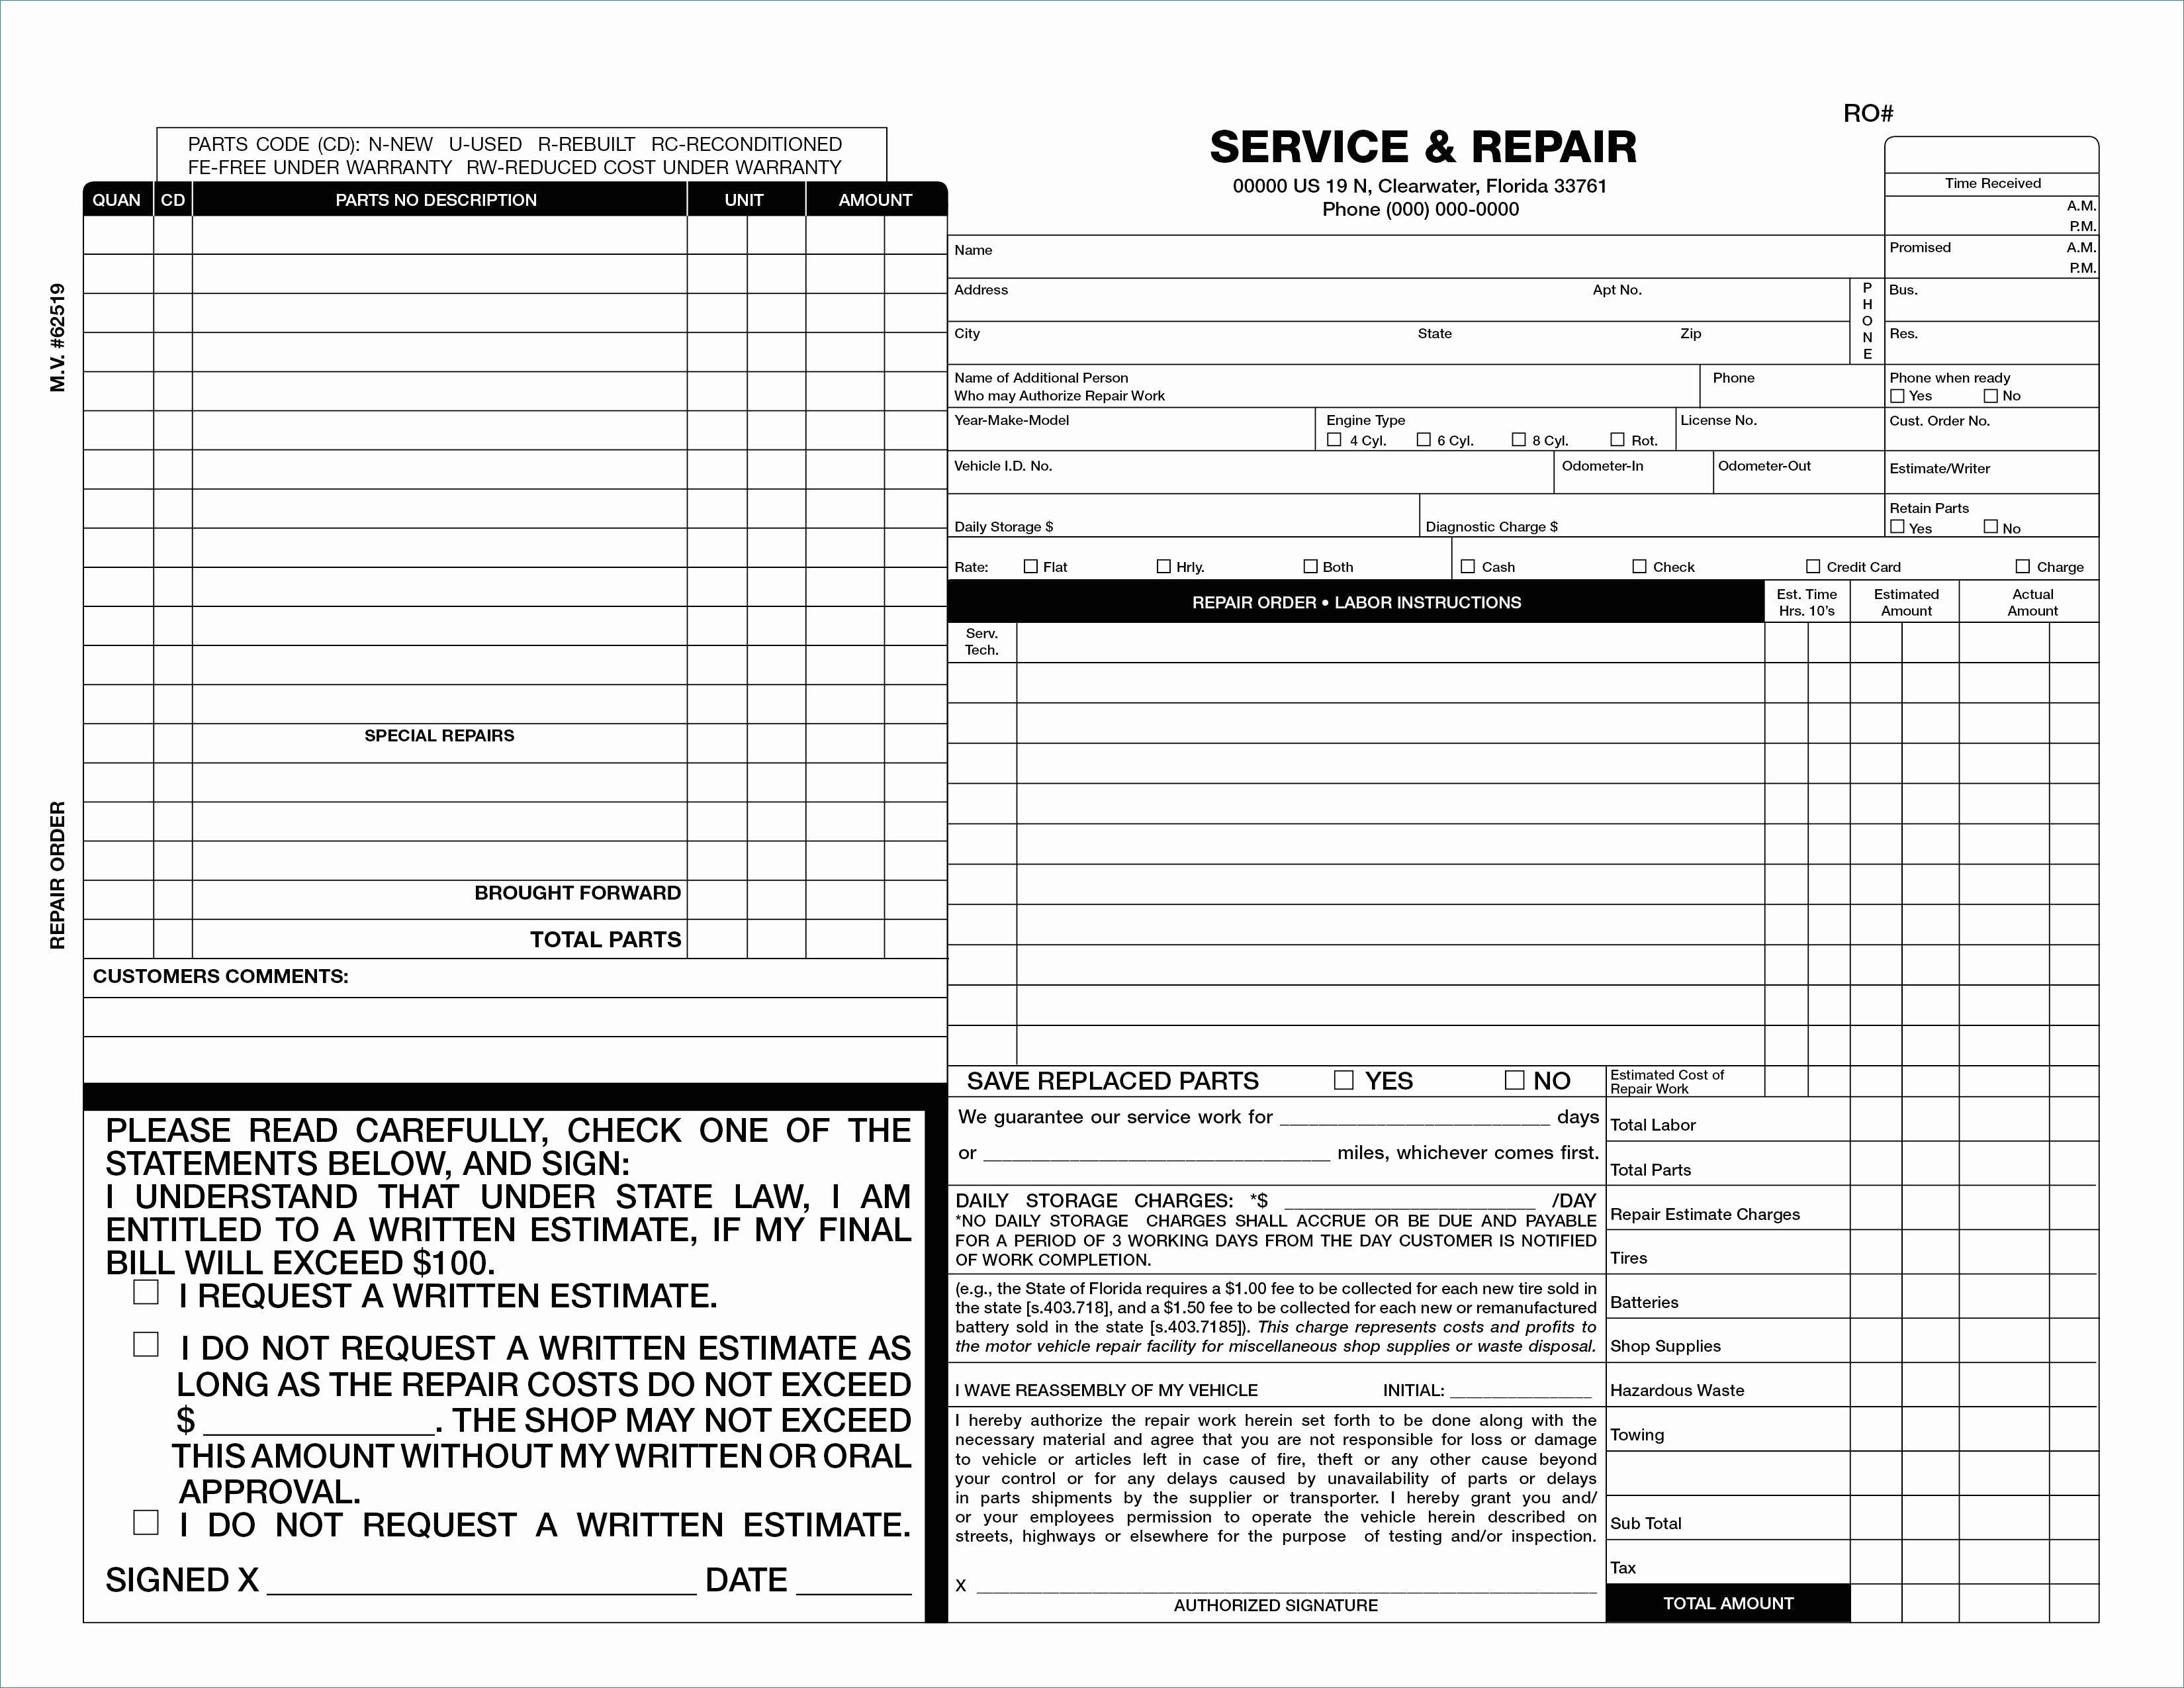 Auto Repair Estimate Template Awesome Practical Auto Body Repair Estimate forms Free